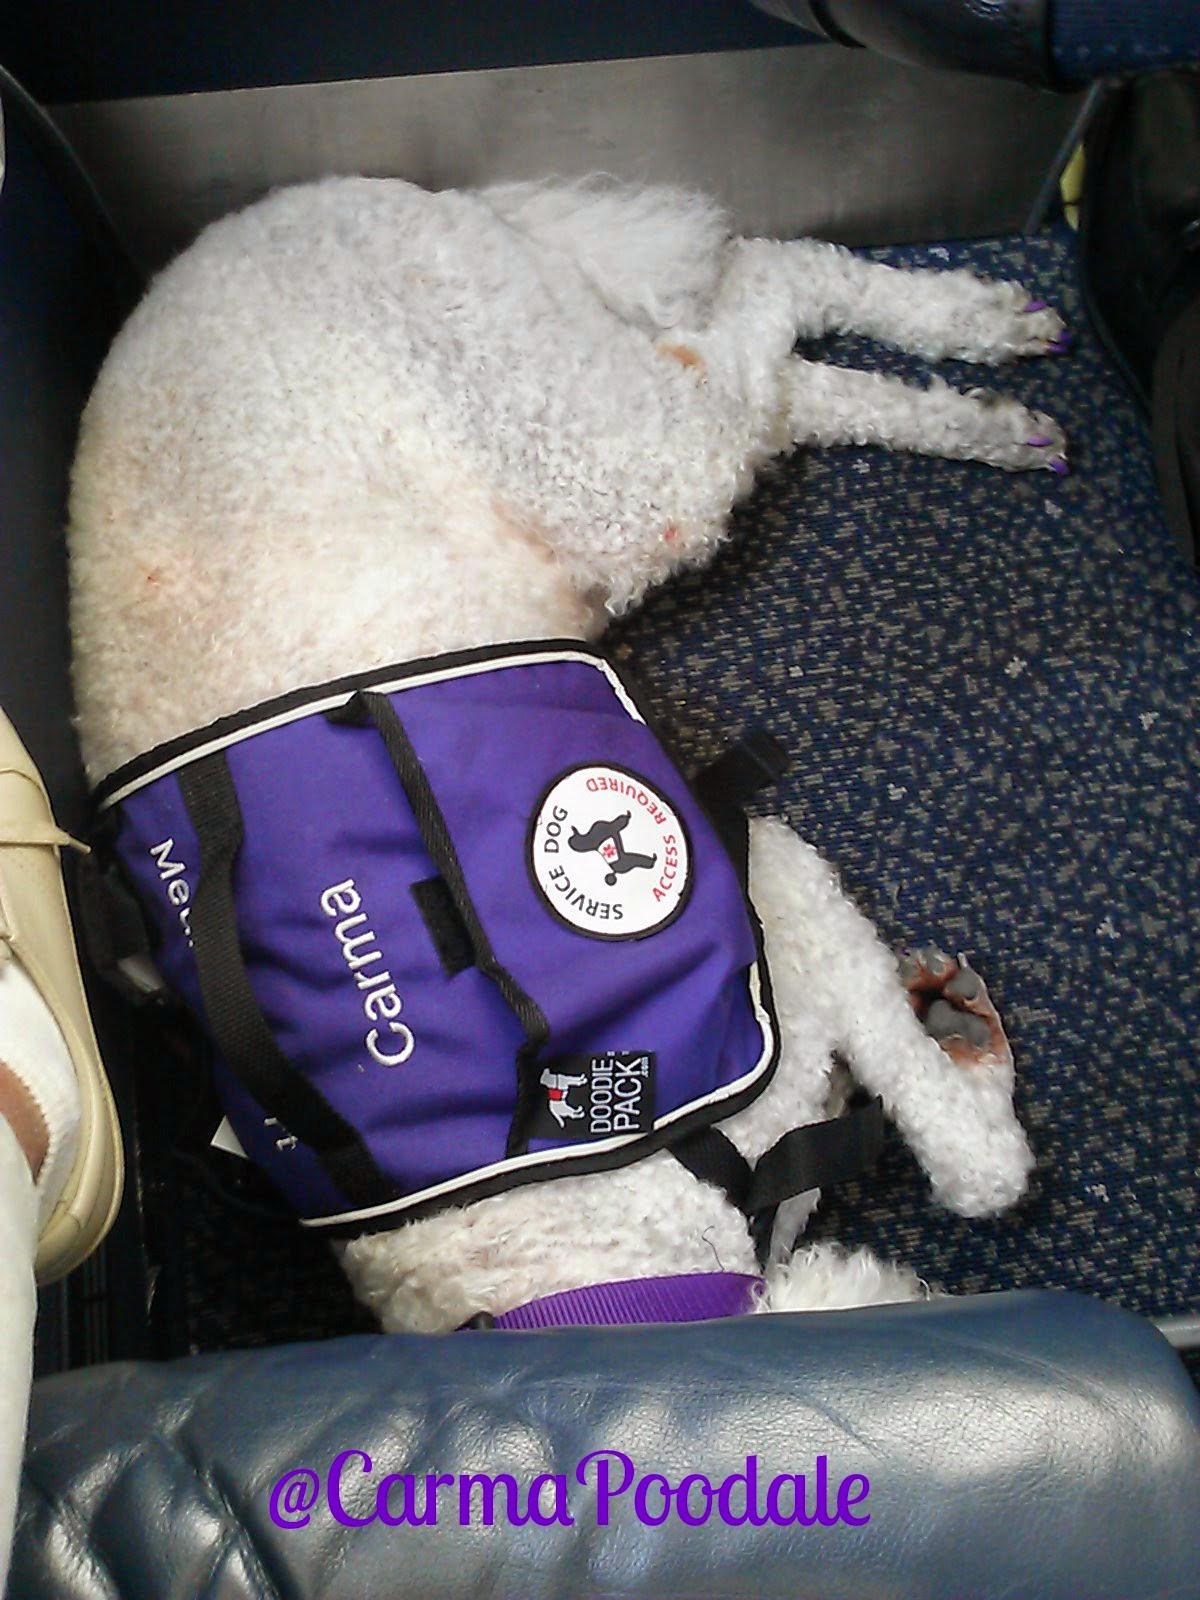 carma sleeping on plane